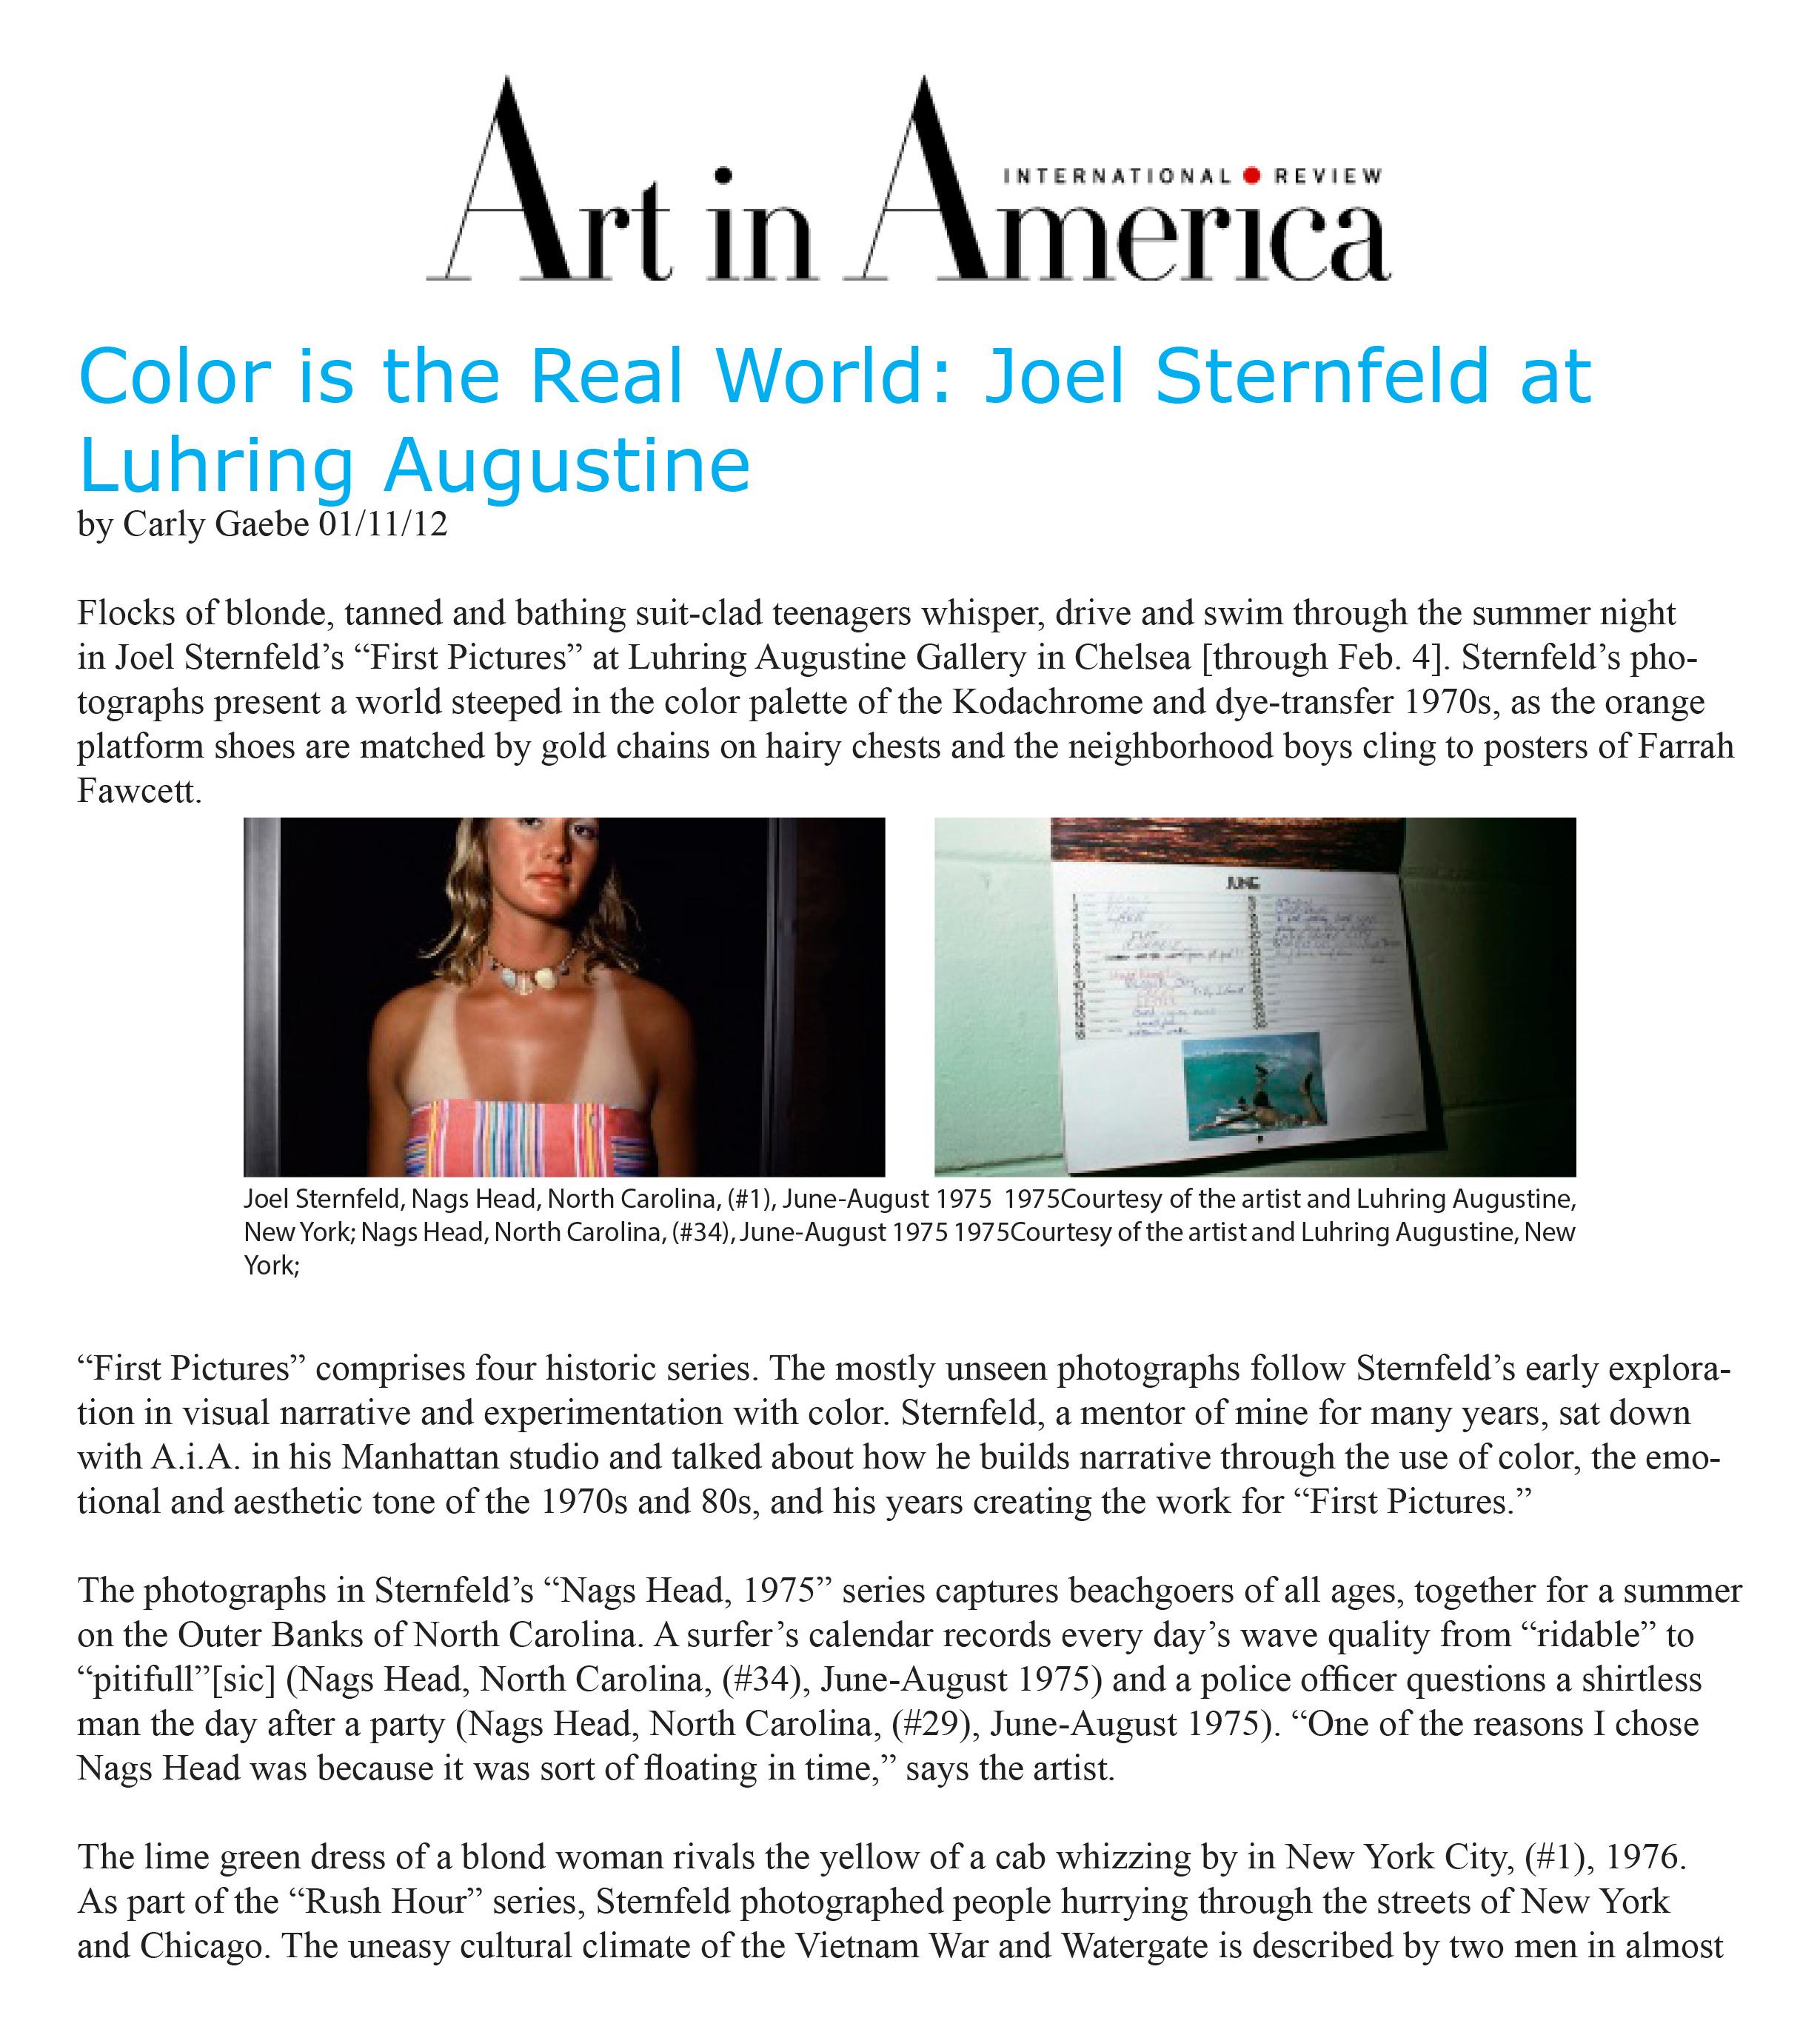 20120111_Art-in-America-1.jpg